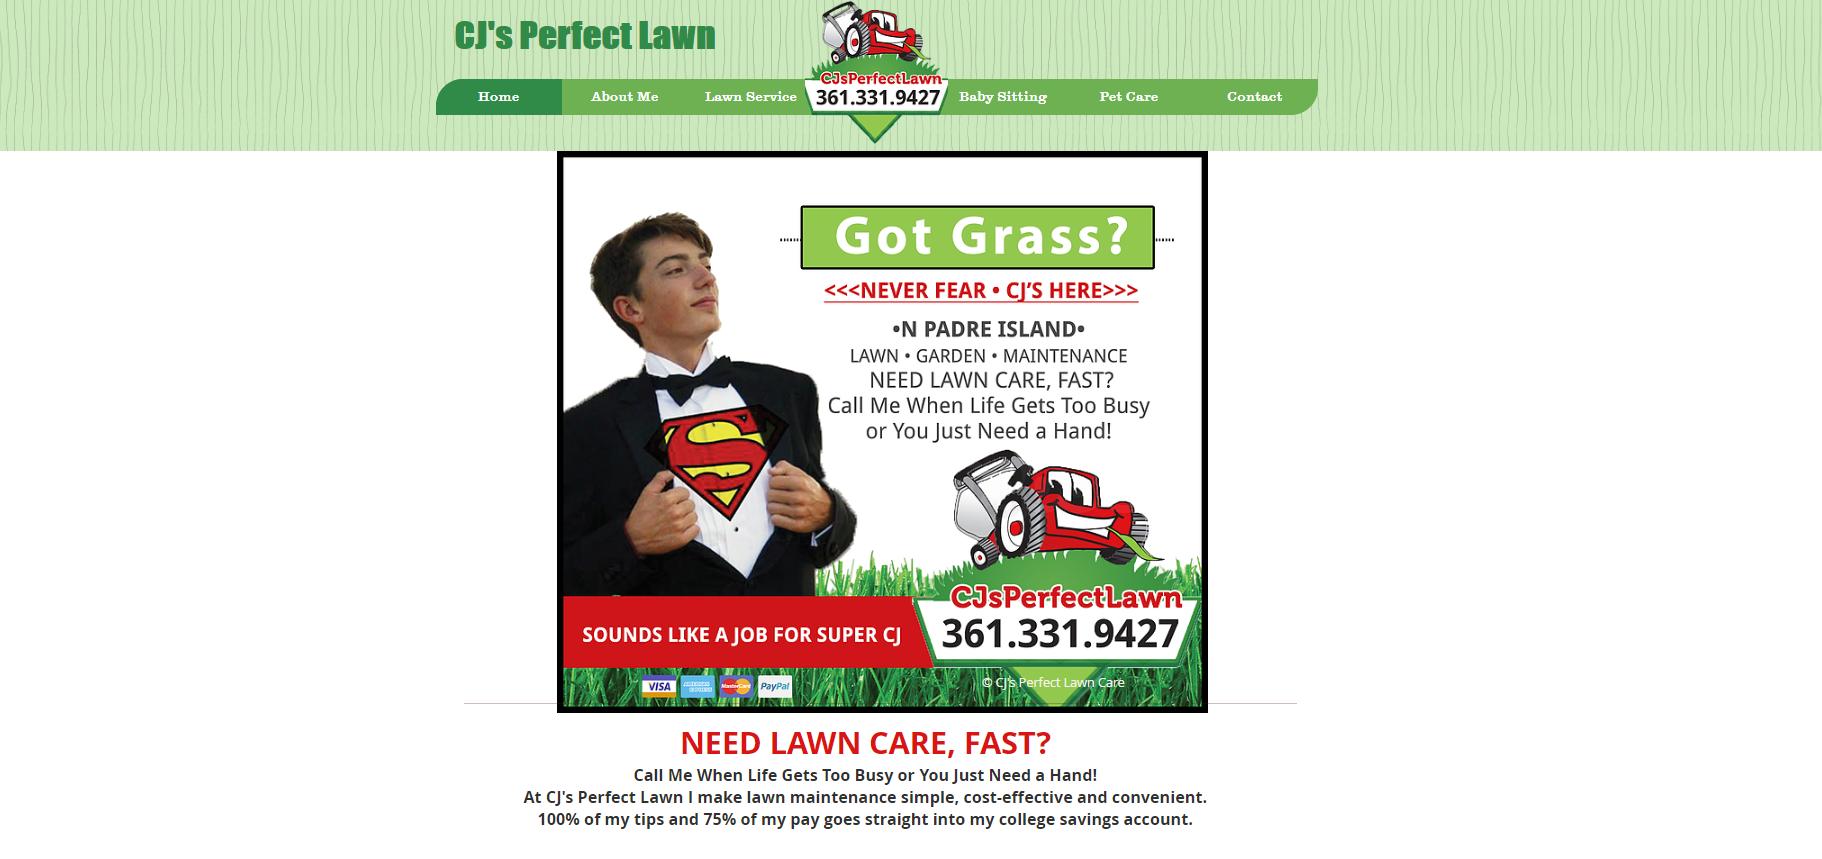 Cj's Perfect Lawn